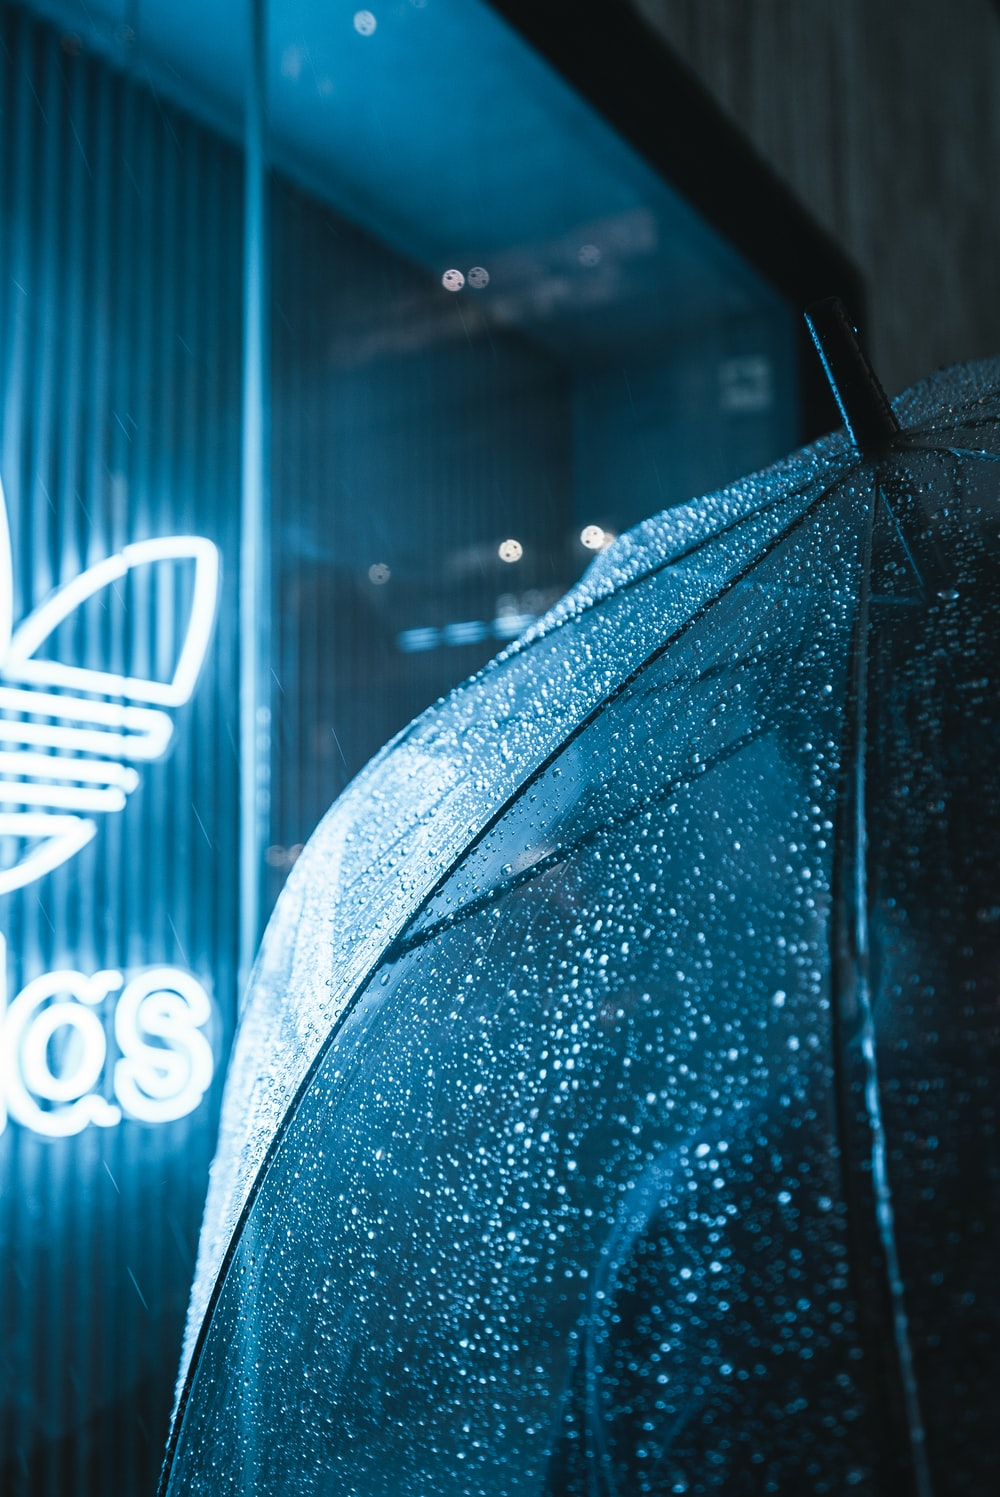 adidas neon signage